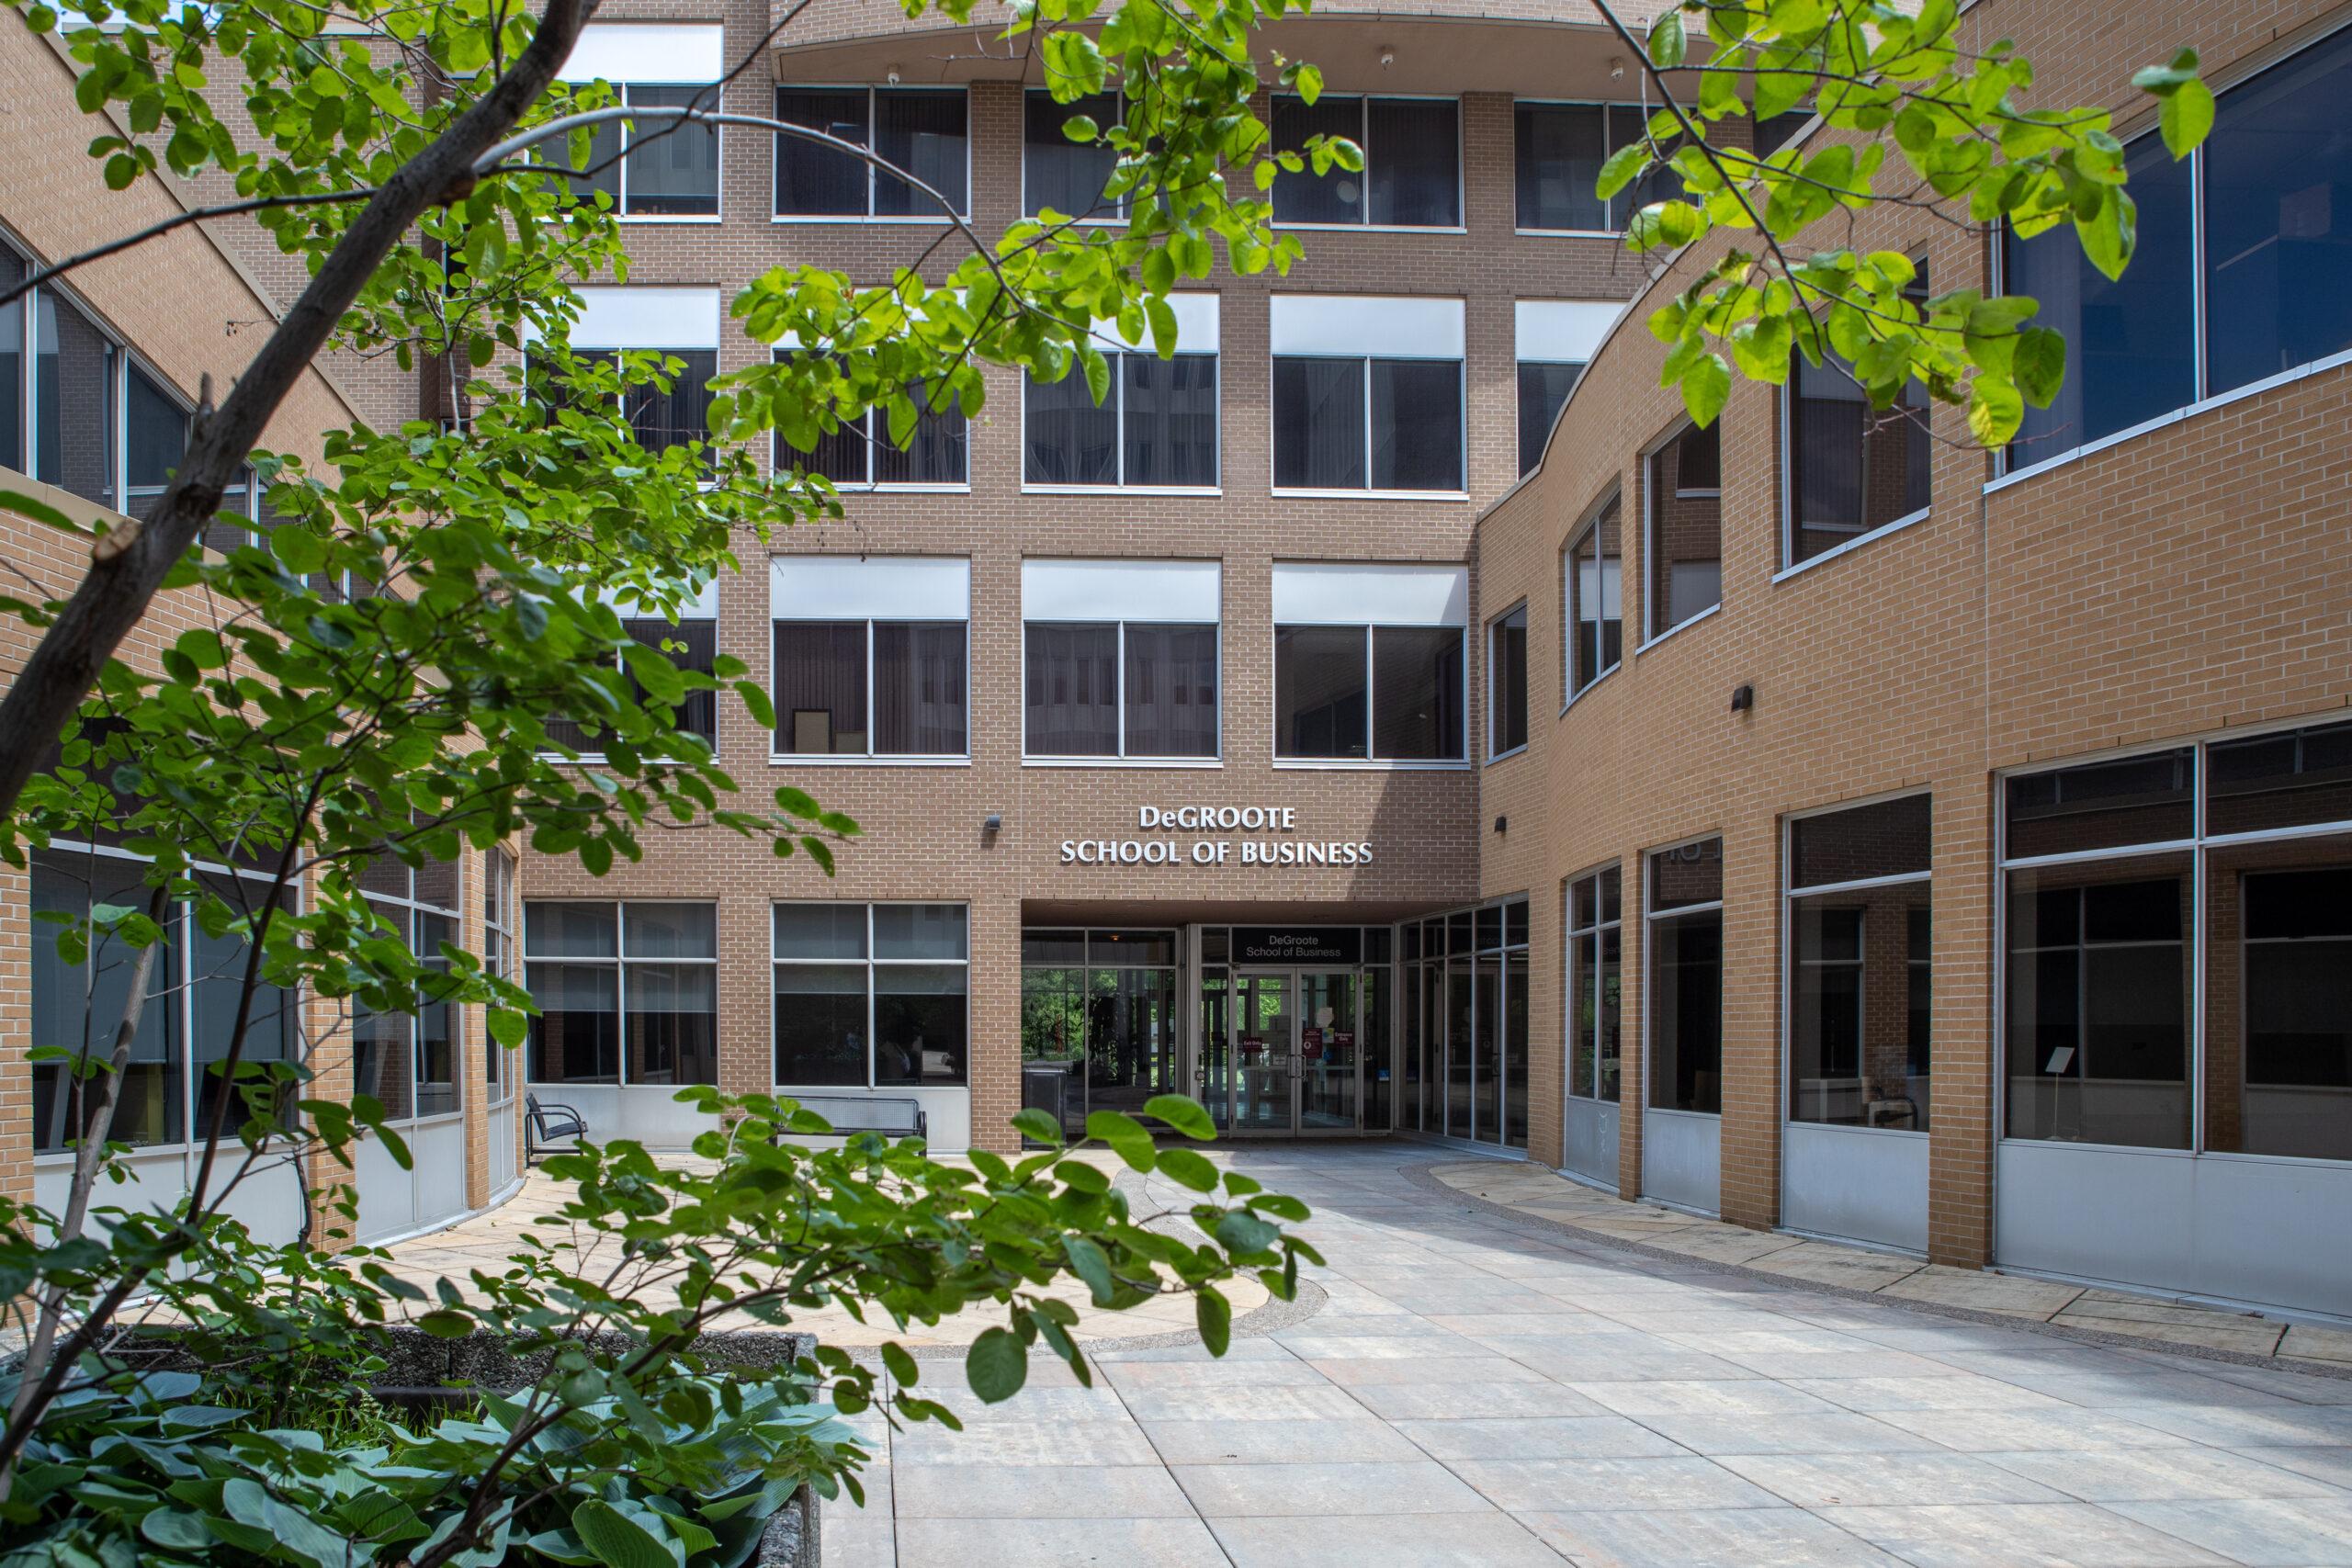 DeGroote School of Business Building